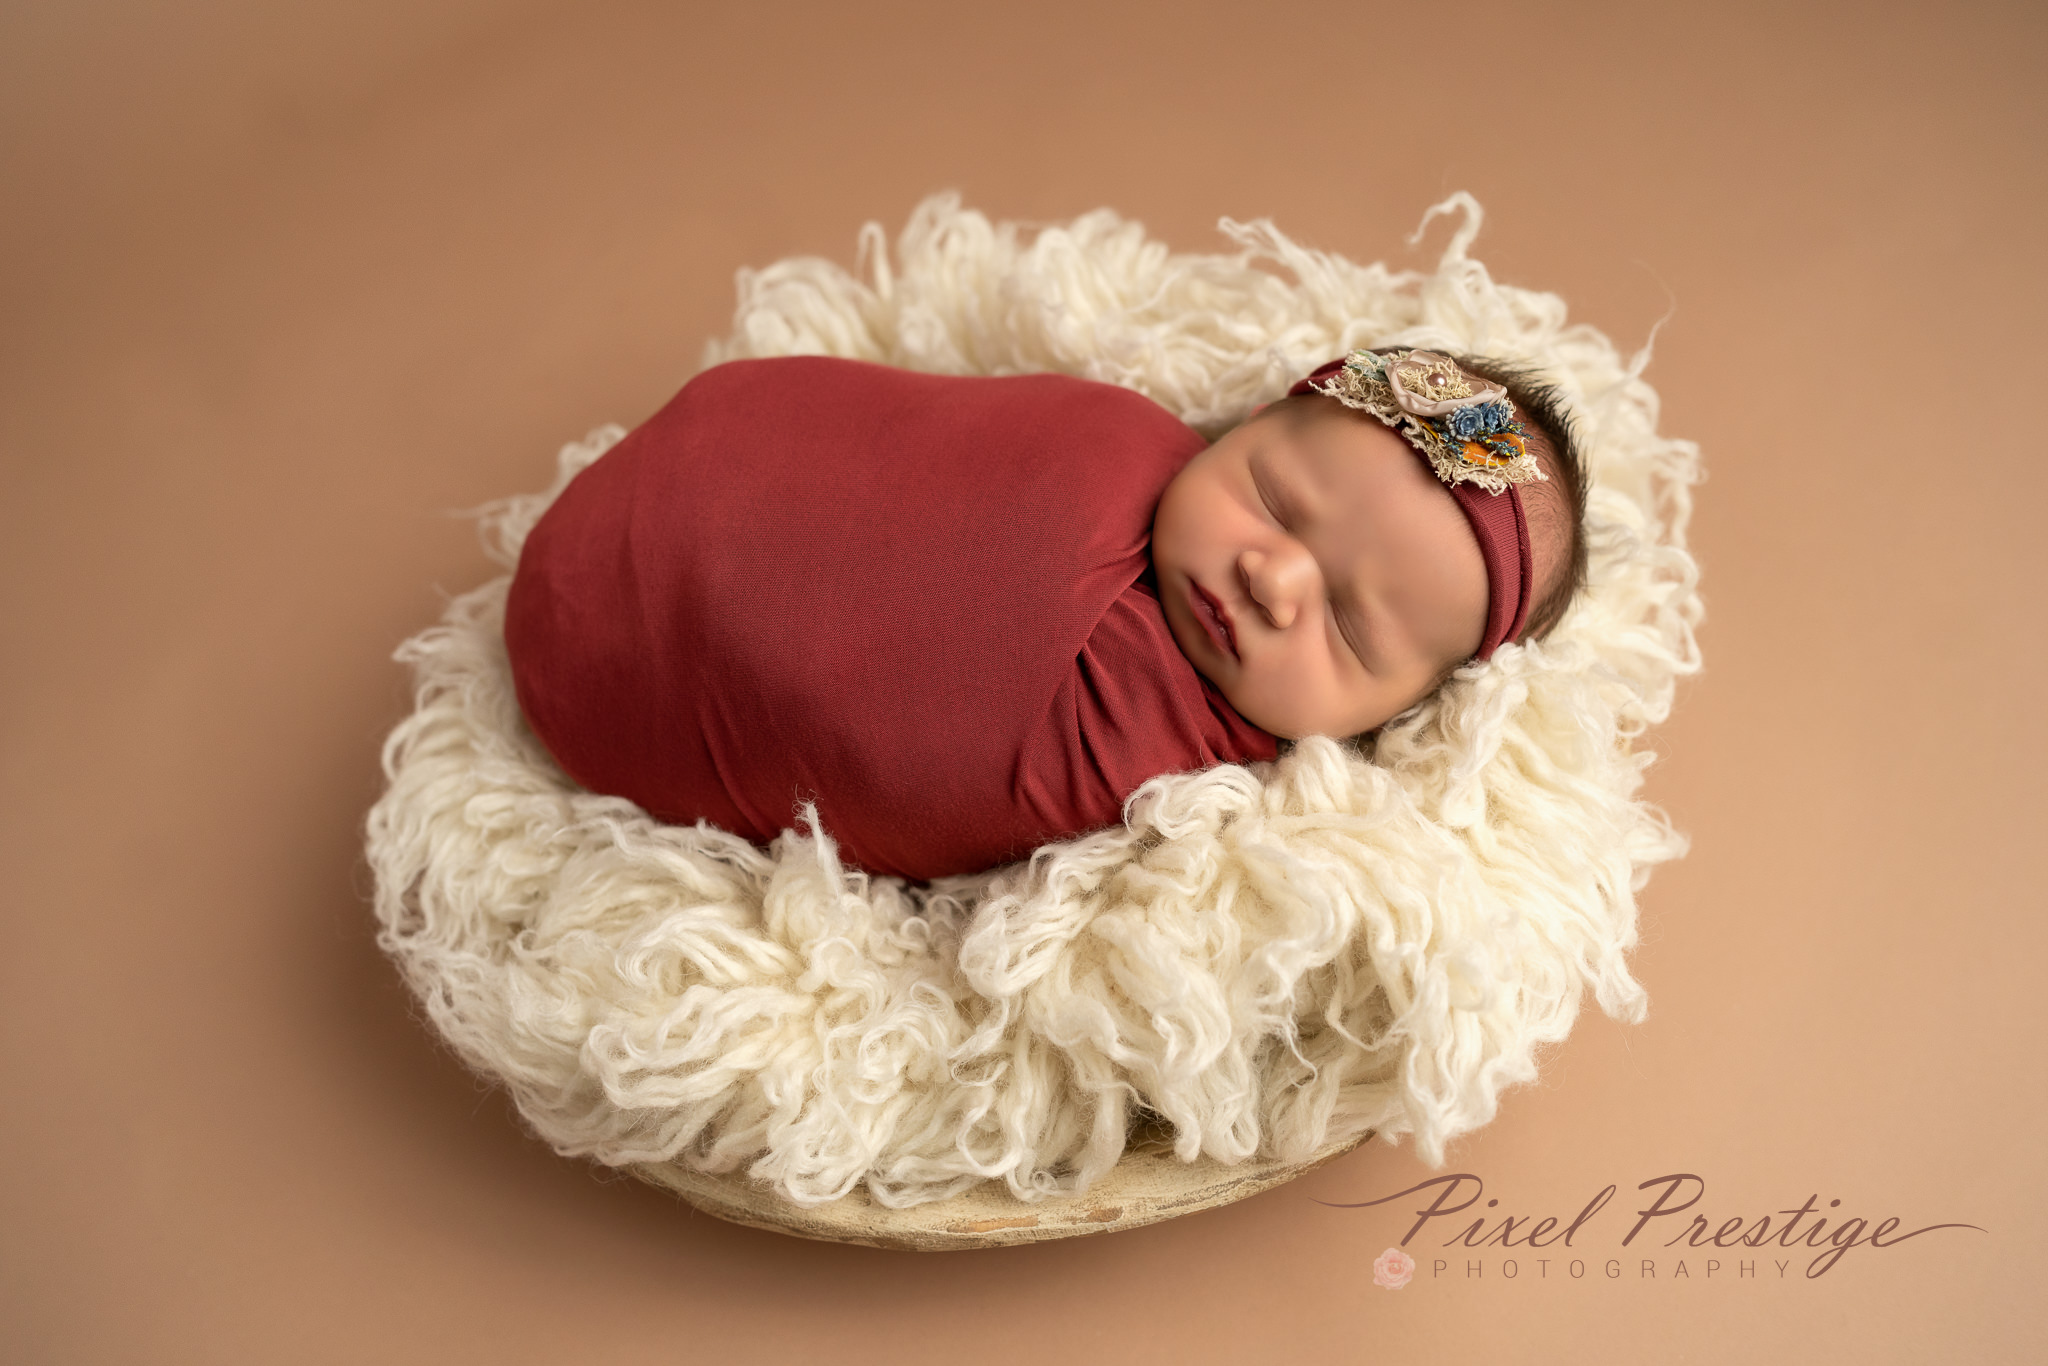 Everly newborn session (17).jpg